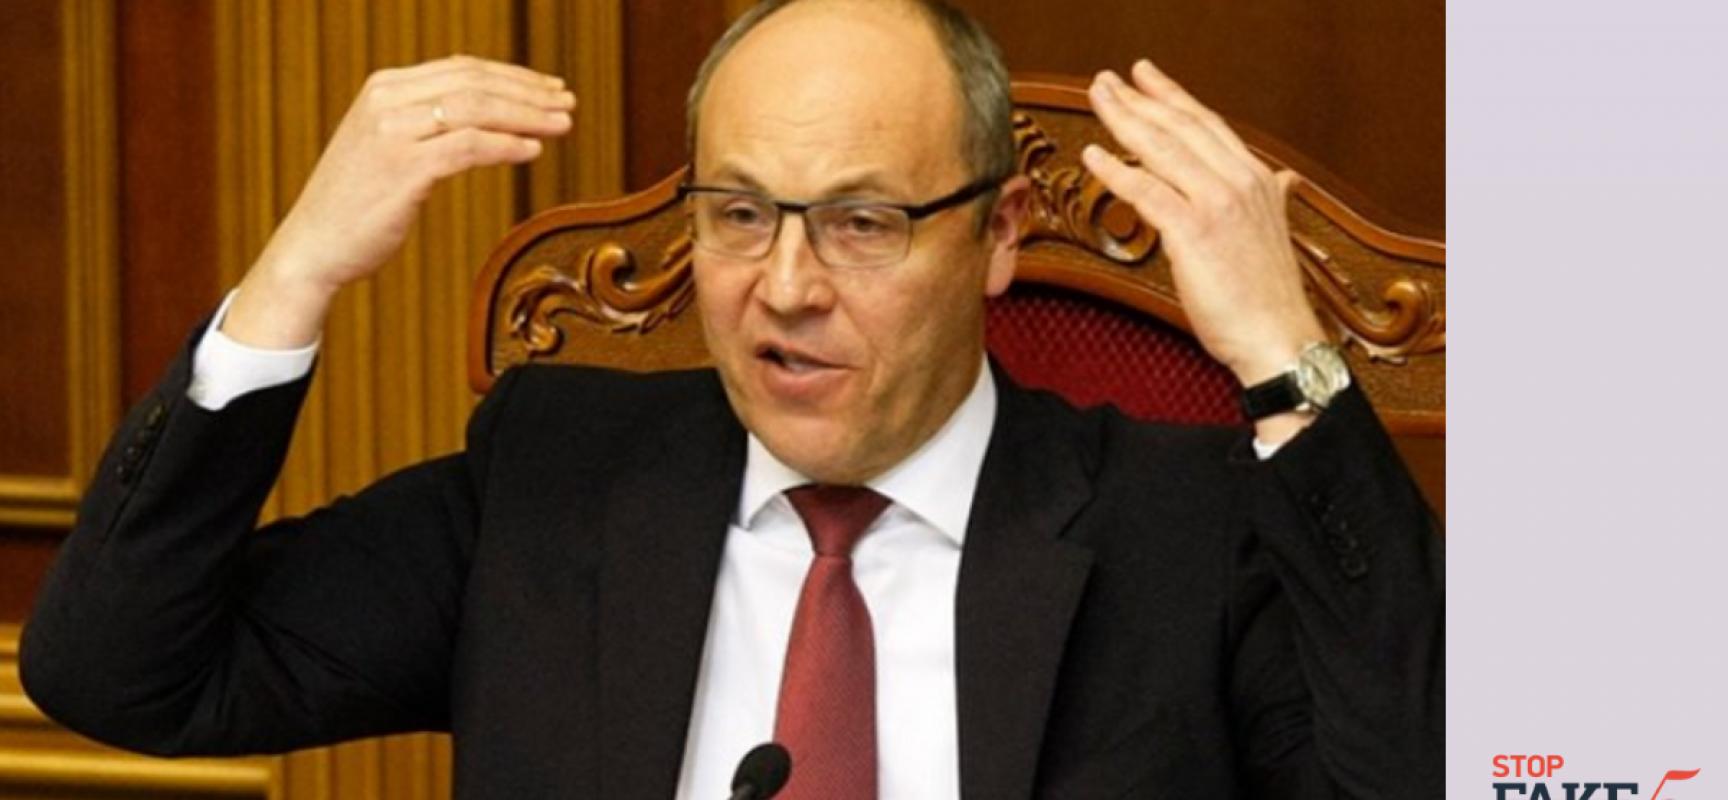 Fake: Ukraine's Parliamentary Speaker Calls for a New Maydan